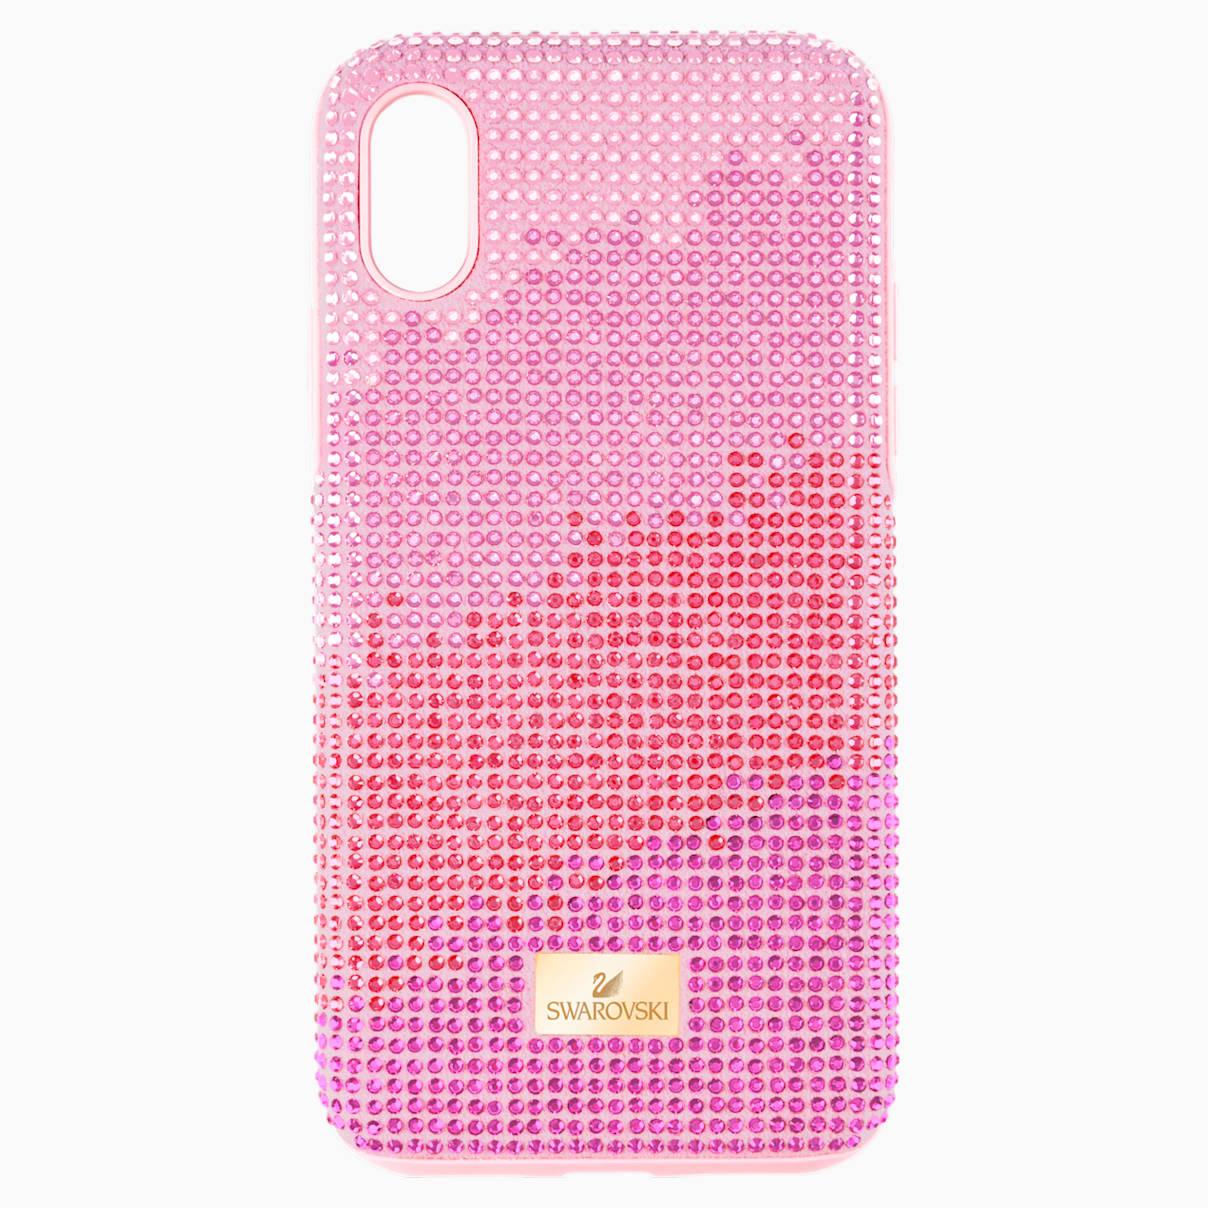 Swarovski High Love Smartphone case with Bumper, iPhone® XS Max, Pink